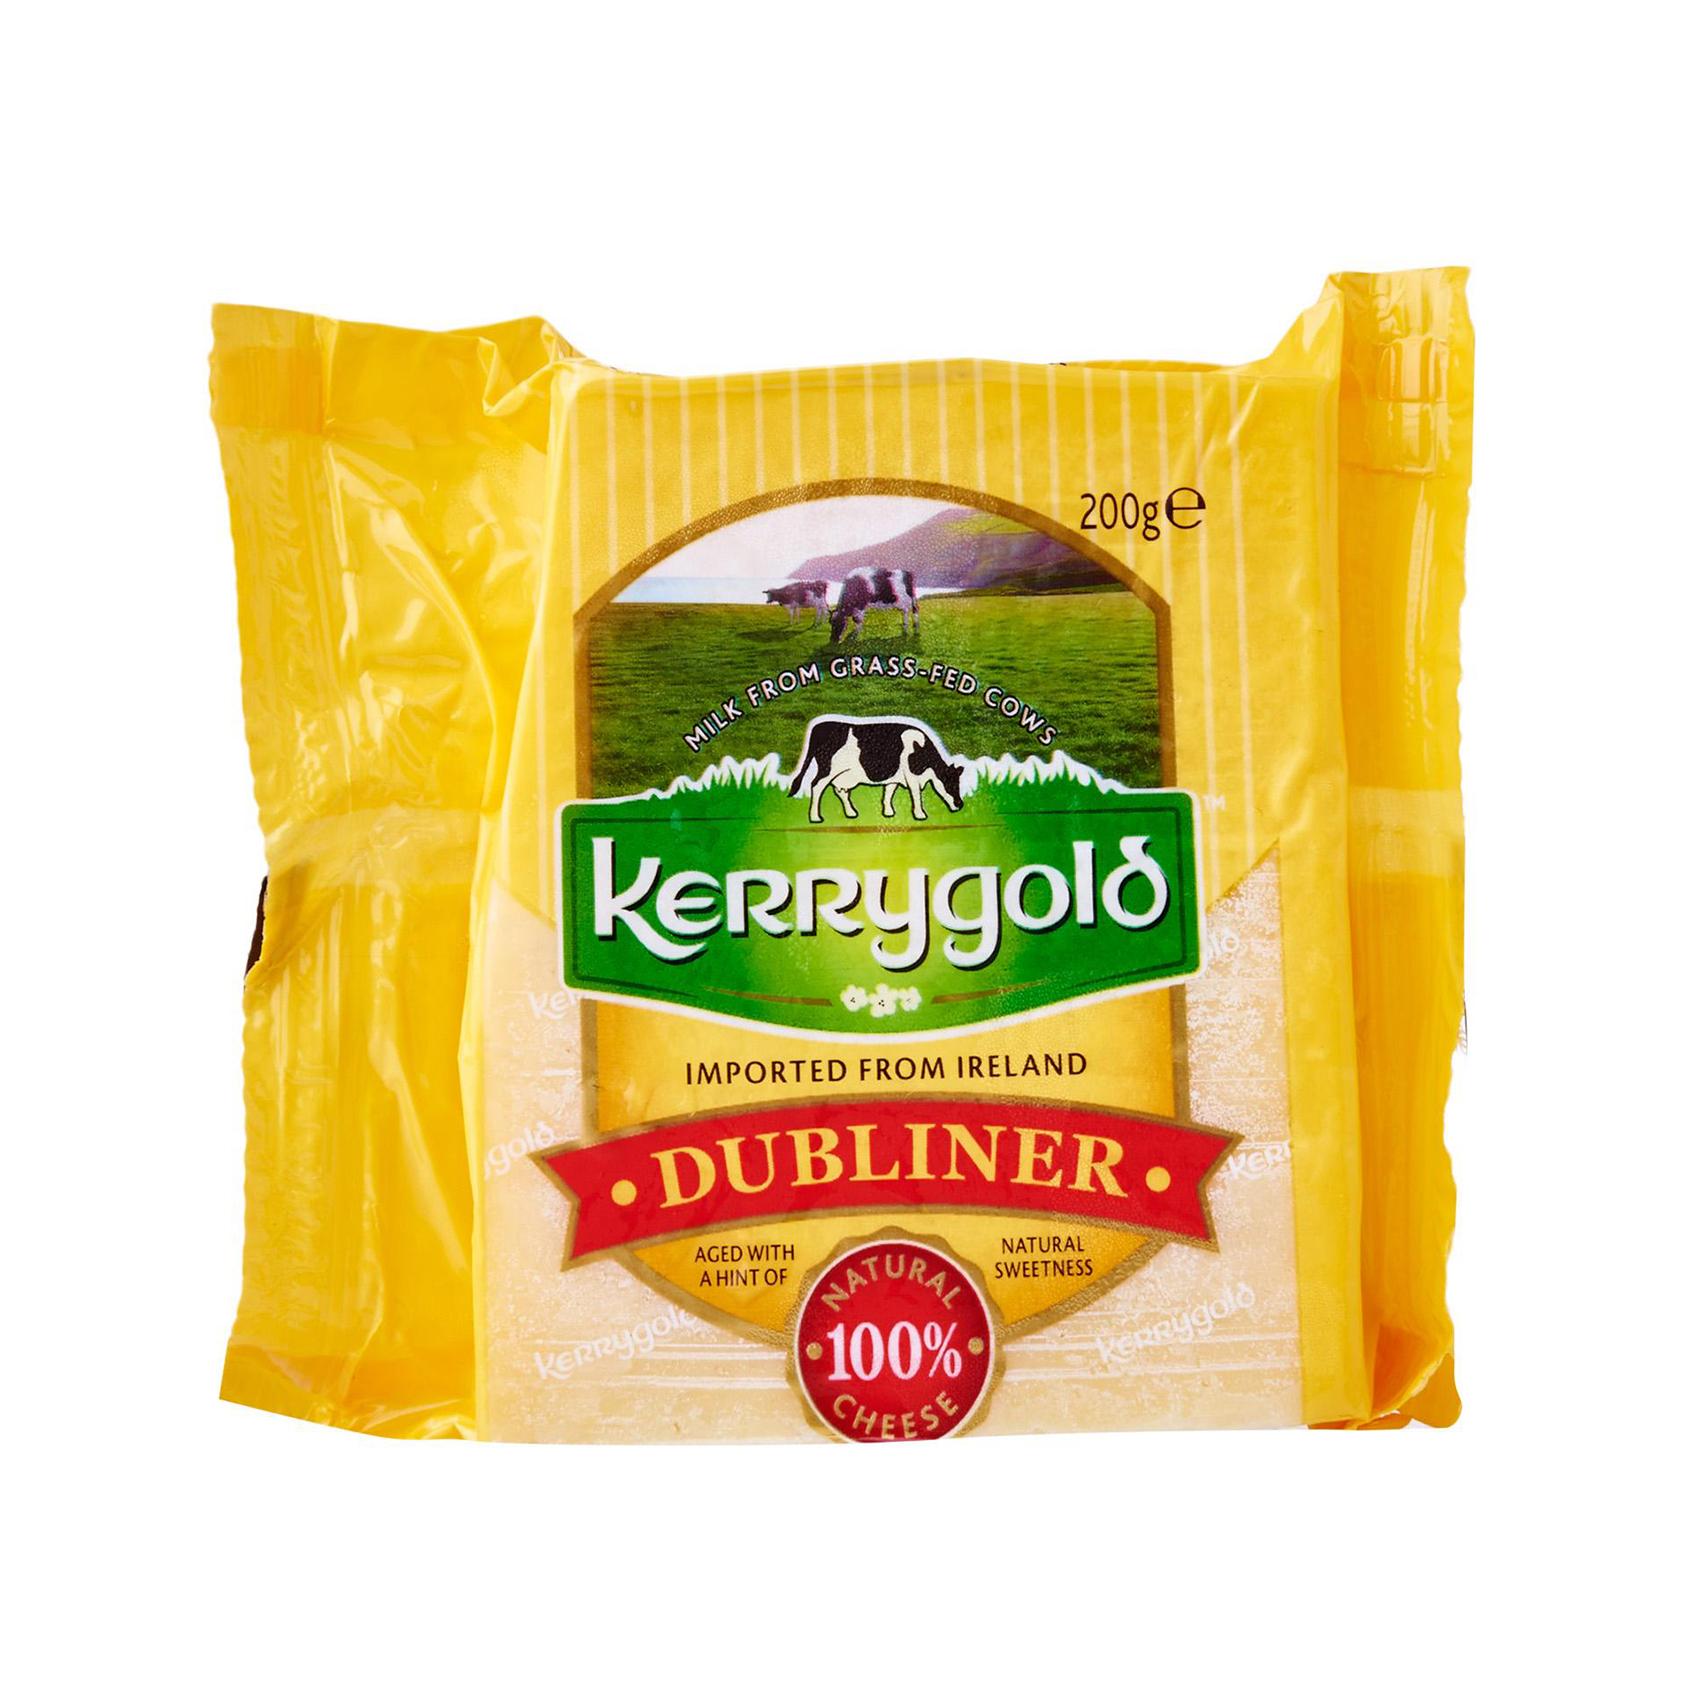 KERRY GOLD DUBLINER CHEDDAR 200G